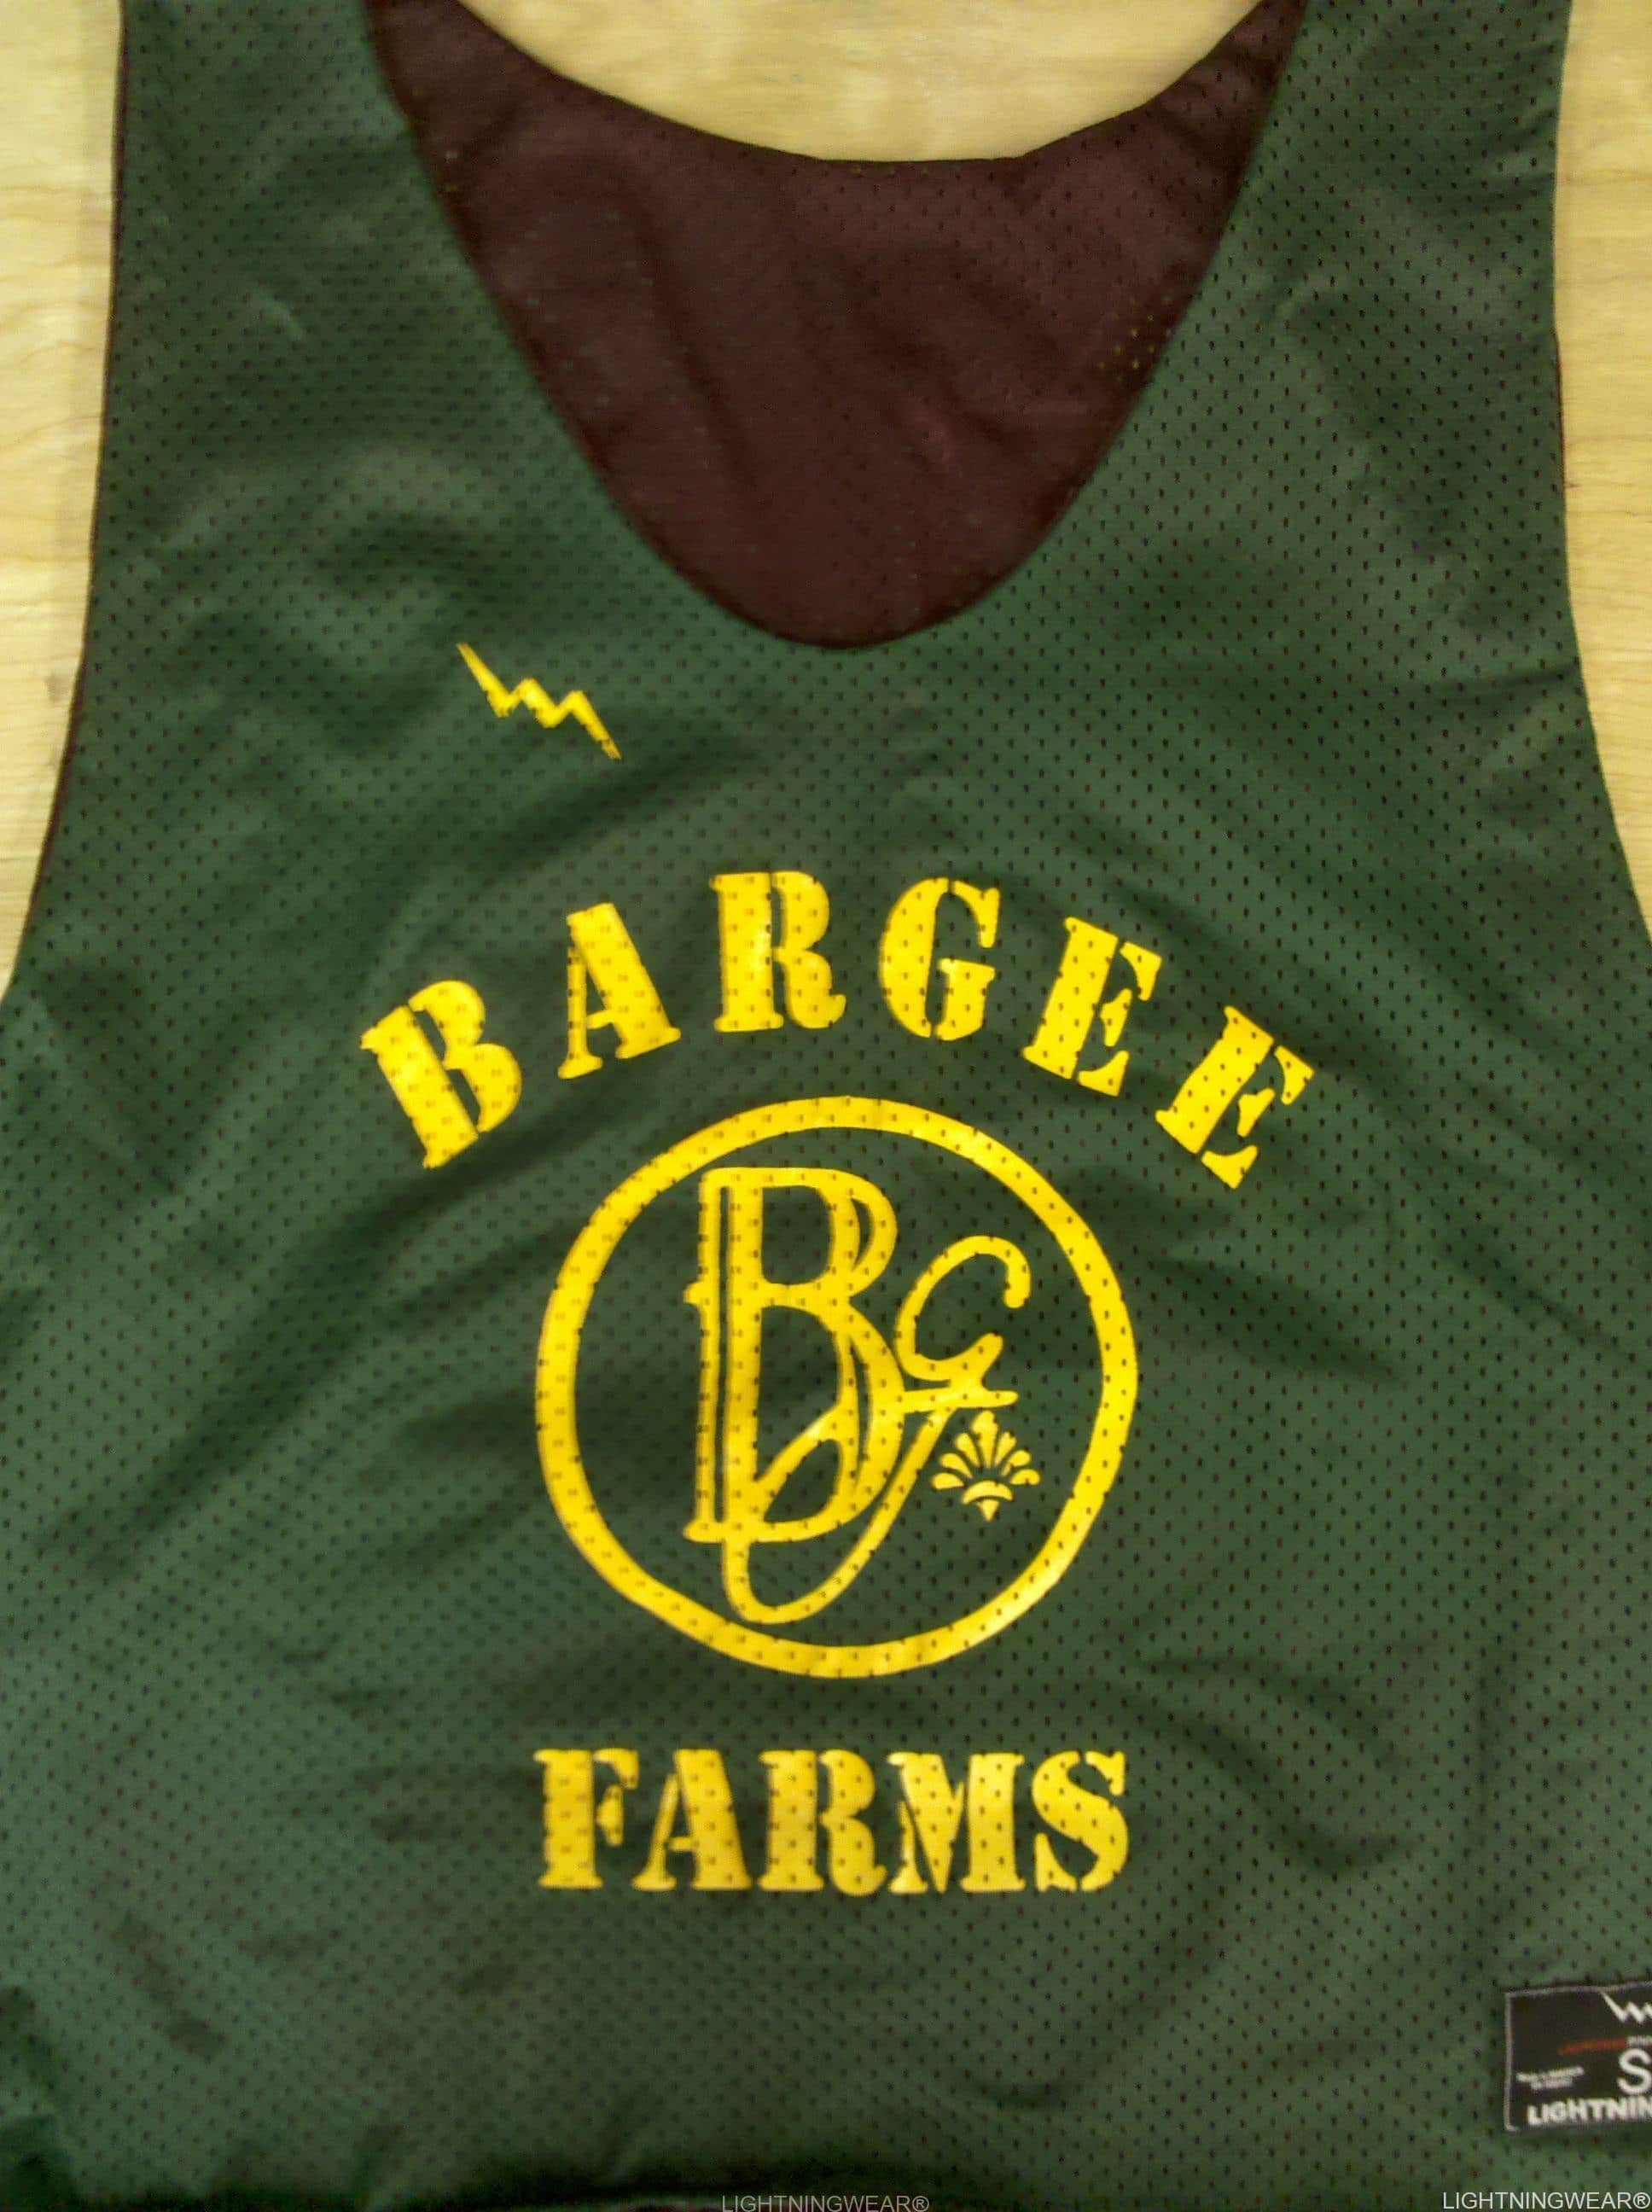 bargee farms pinnies